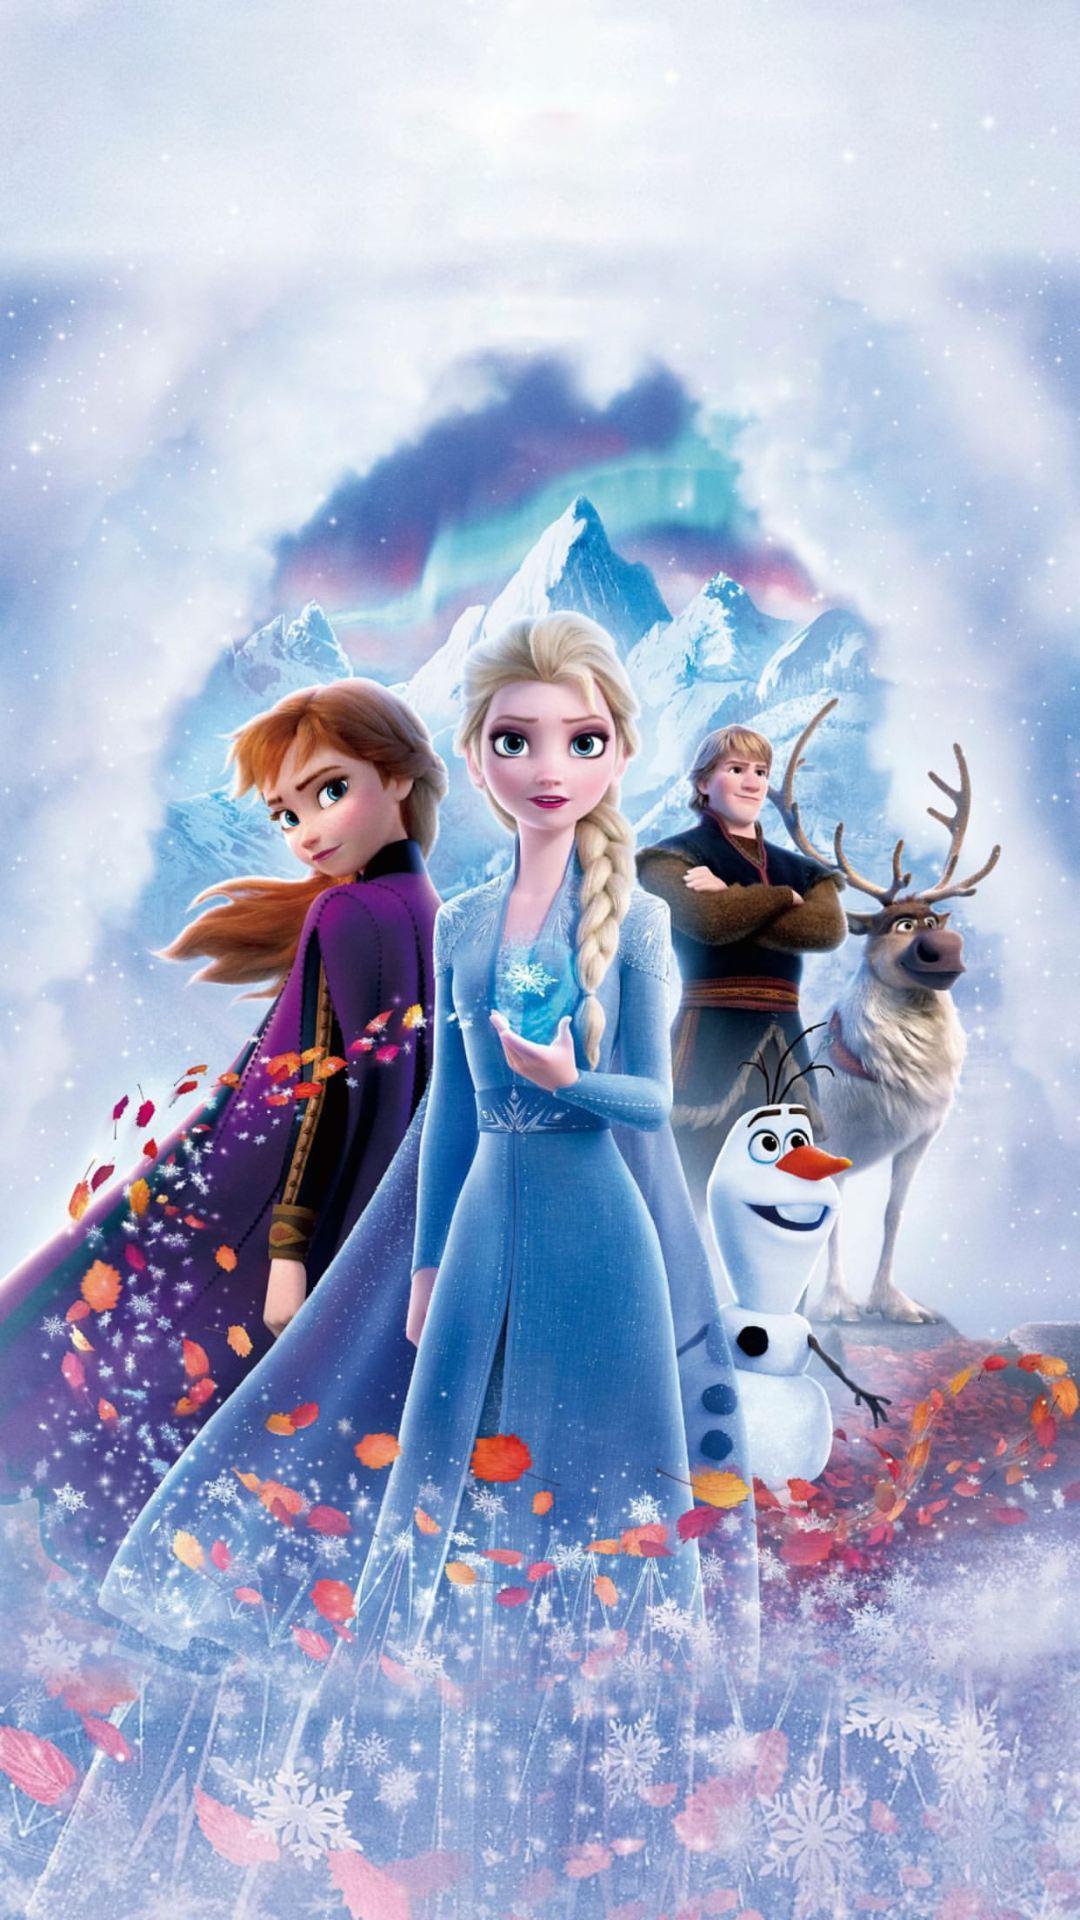 Frozen 2 Textless Poster